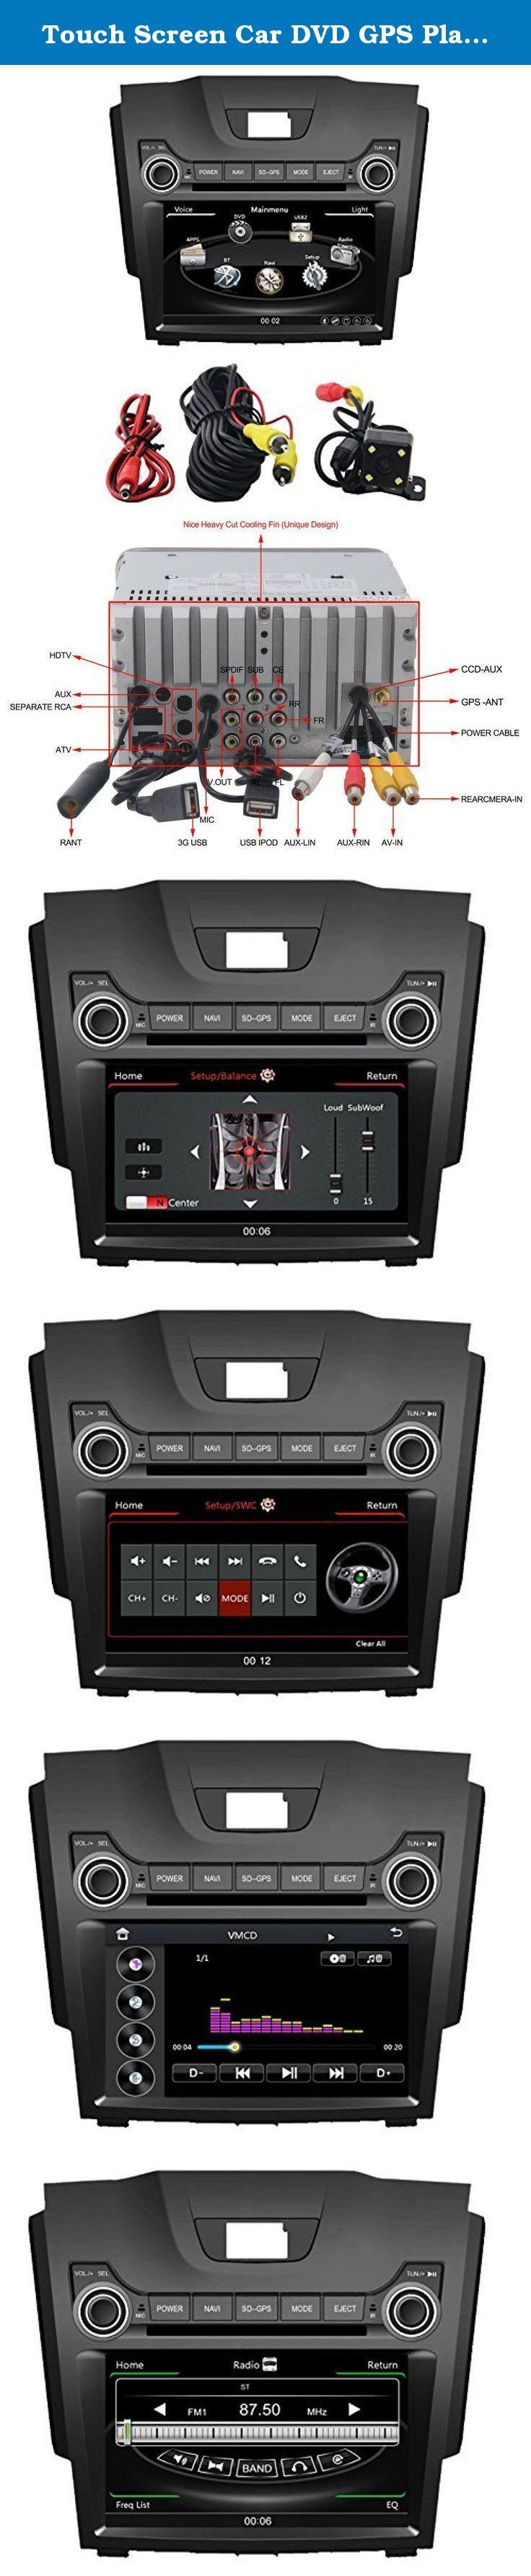 Touch Screen Car Dvd Gps Player For Chevrolet S10 Trailblazer Isuzu D Max Navigation Radio Bt Tv Ipod 3g Free Navigation Map Chevrolet Trailblazer Isuzu D Max